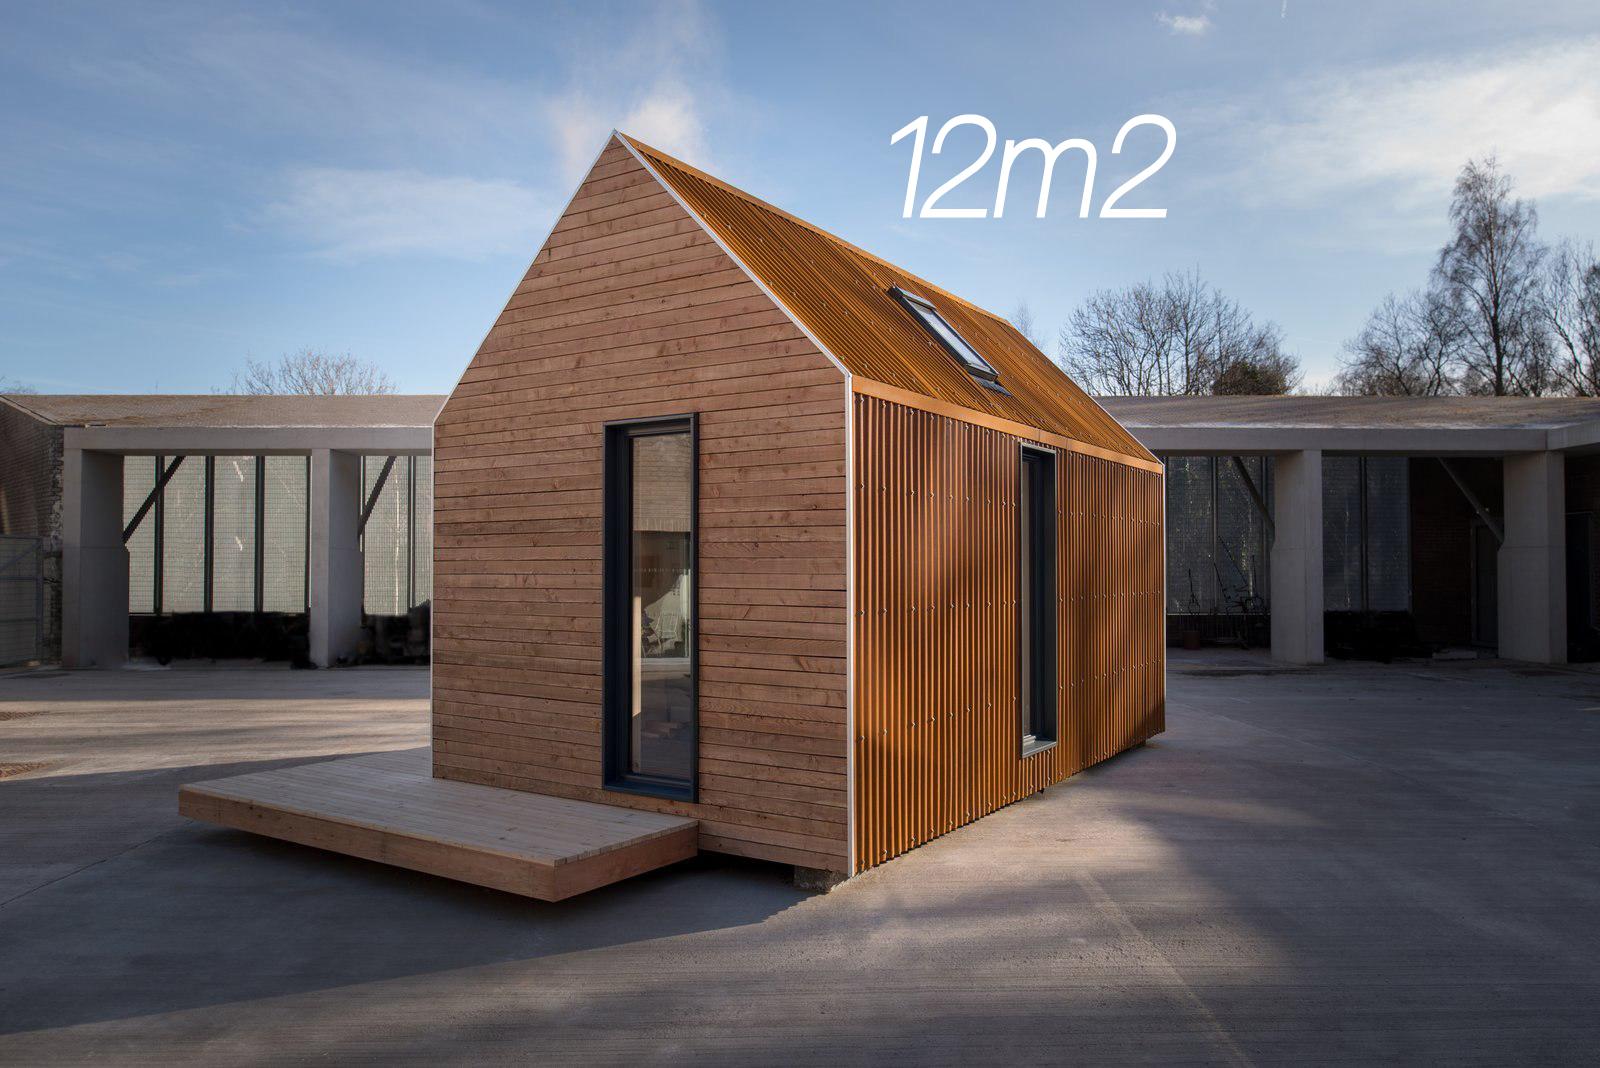 Tiny house, malutki domek, 12m2